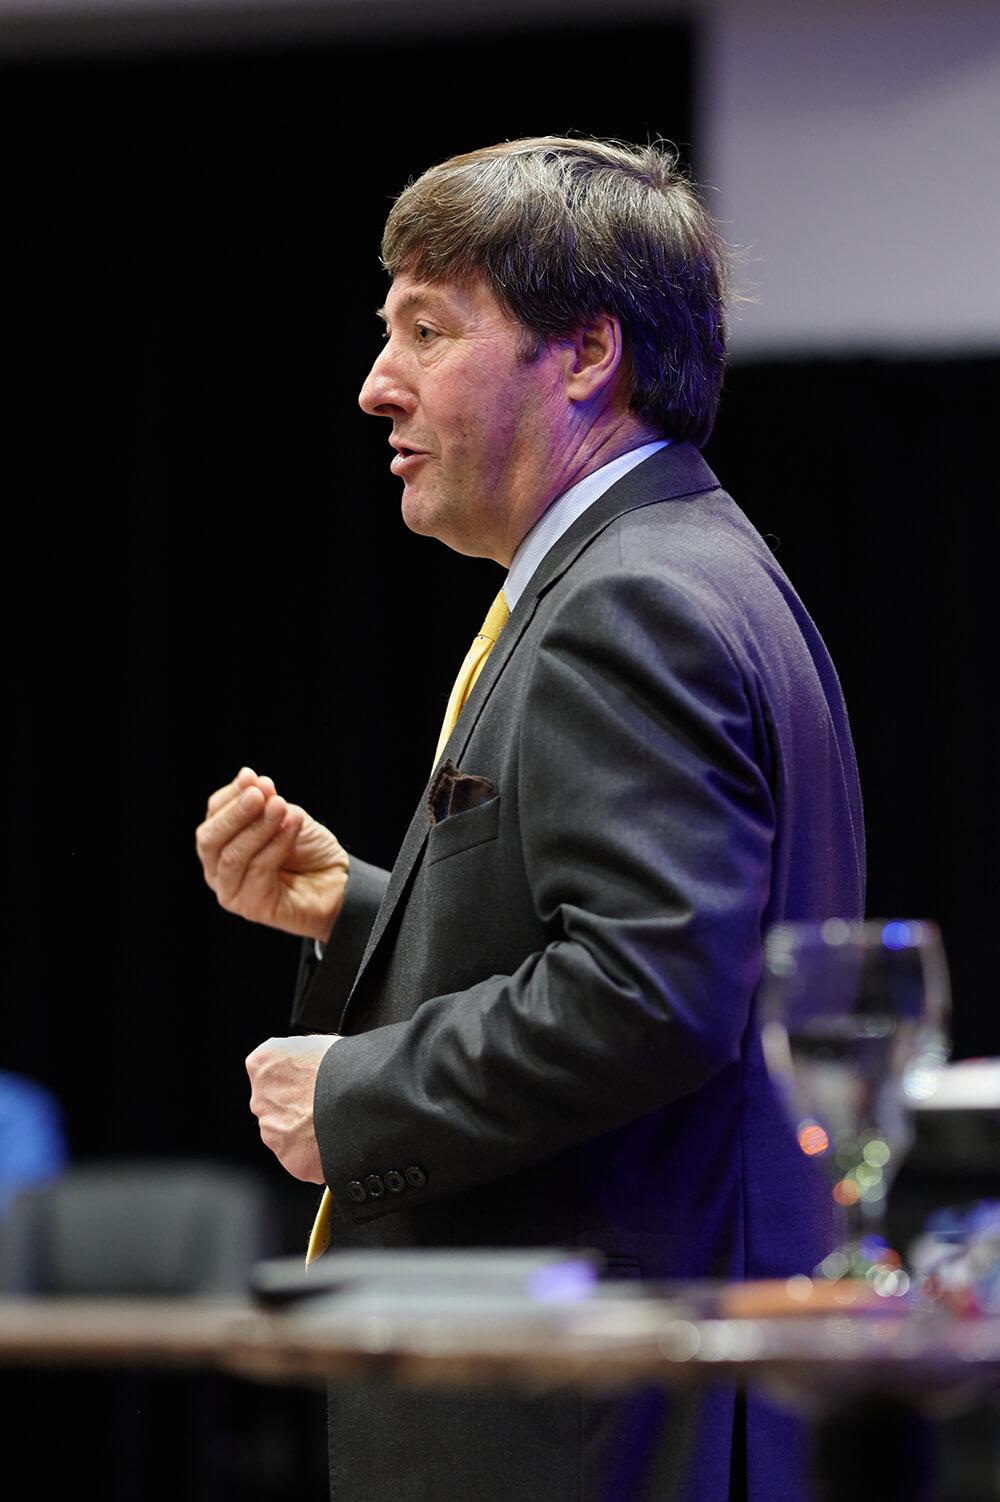 Eamonn O'Brien - Leading Business Storytelling Coach and Keynote Speaker